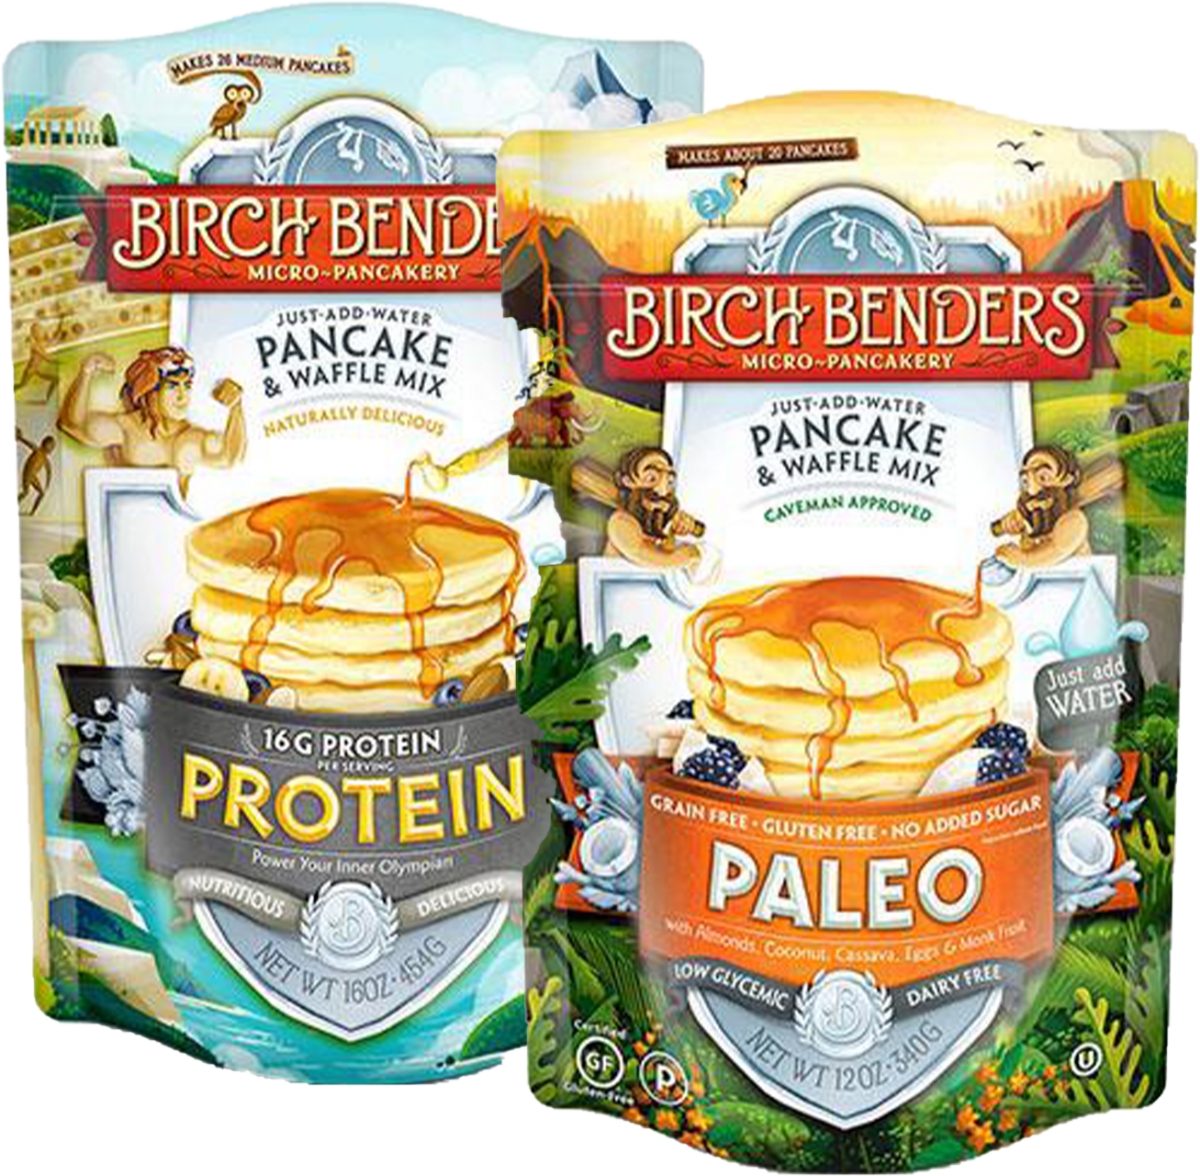 Birch Benders Pancake and Waffle Mixes